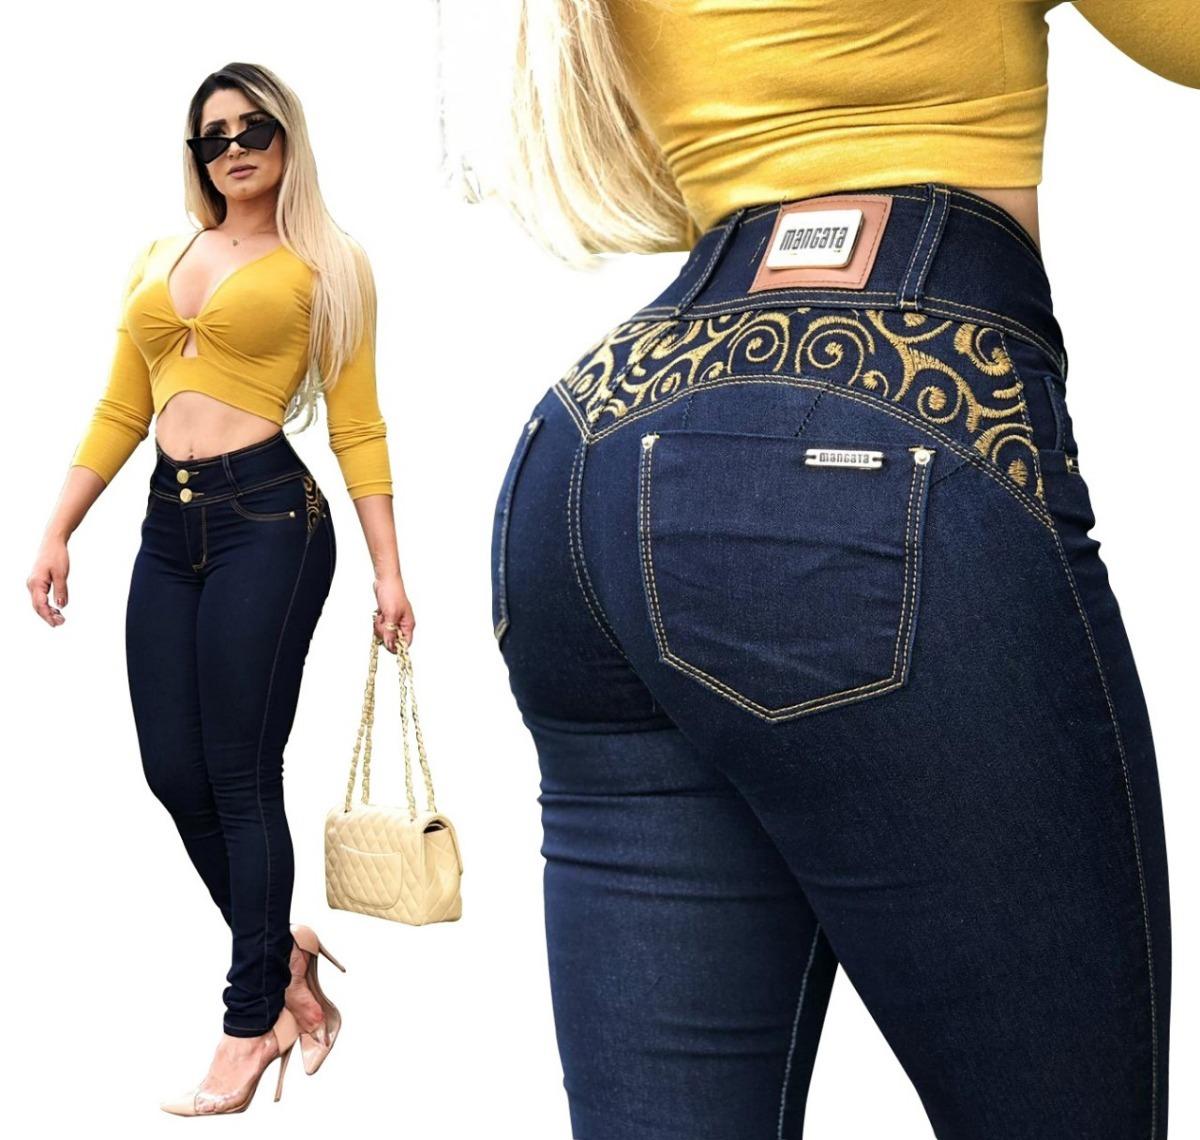 f598426d2465a calça jeans feminina cintura alta premium estilo pitbull. Carregando zoom.